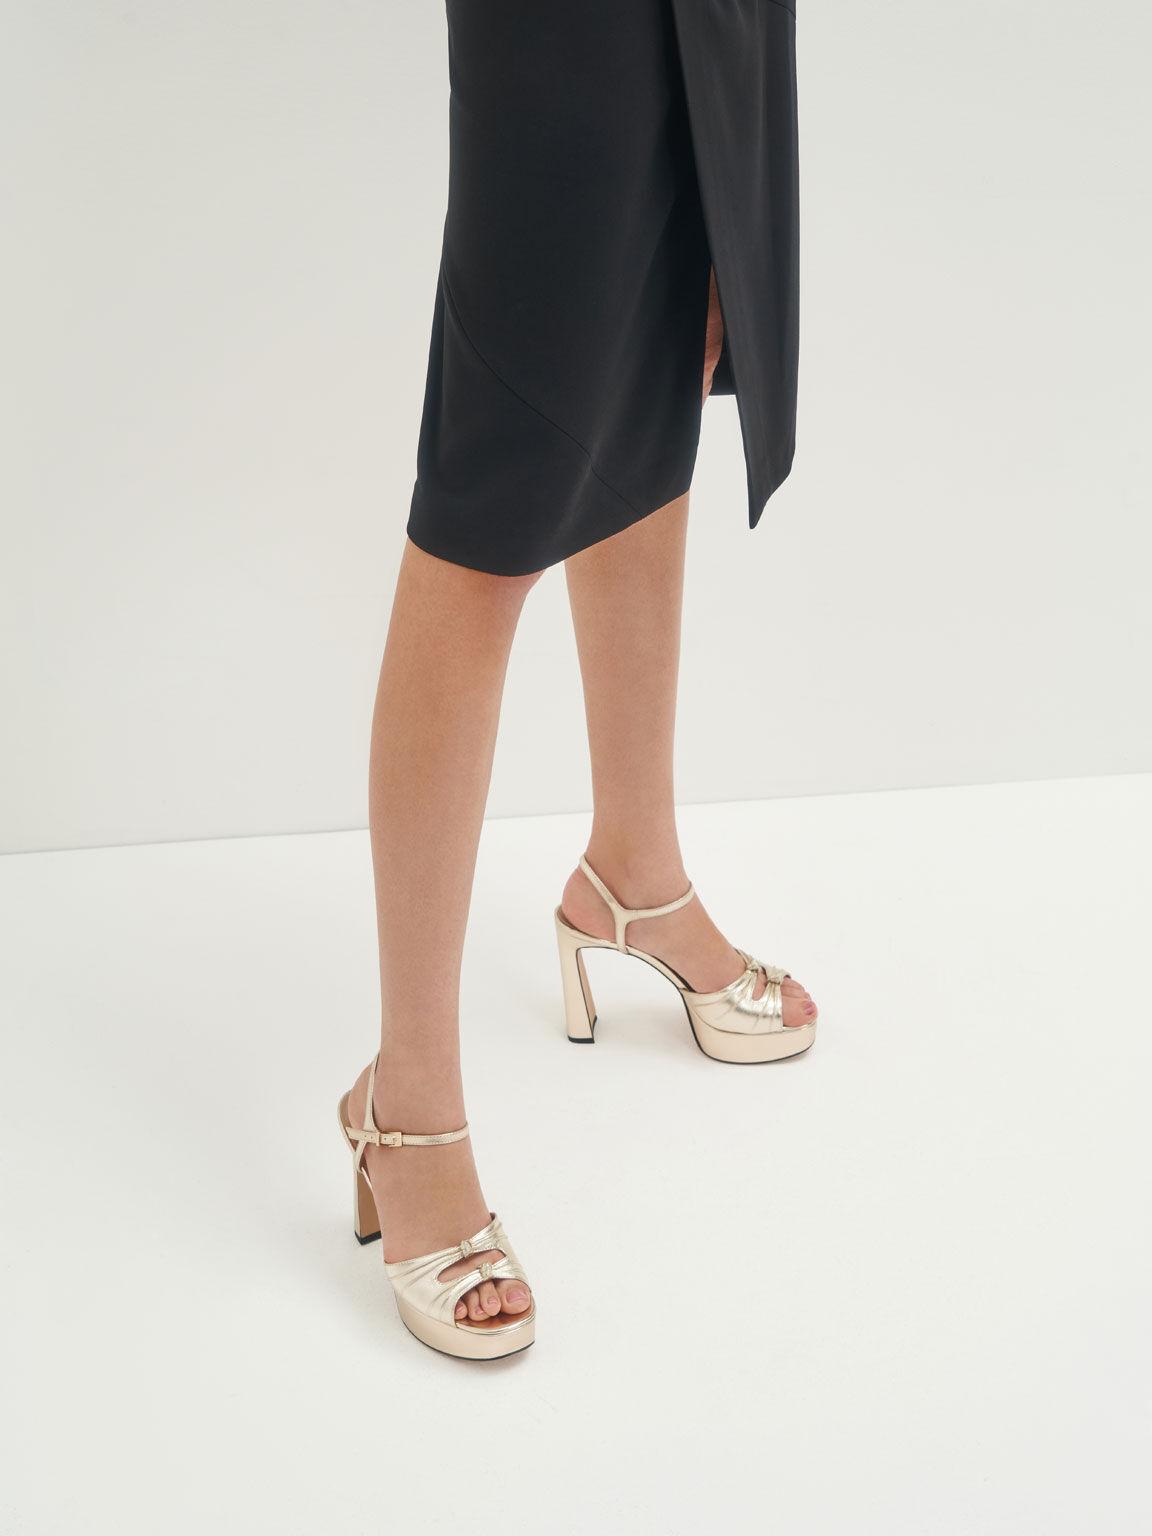 Knot Detail Metallic Platform Sandals (Kid Leather), Gold, hi-res